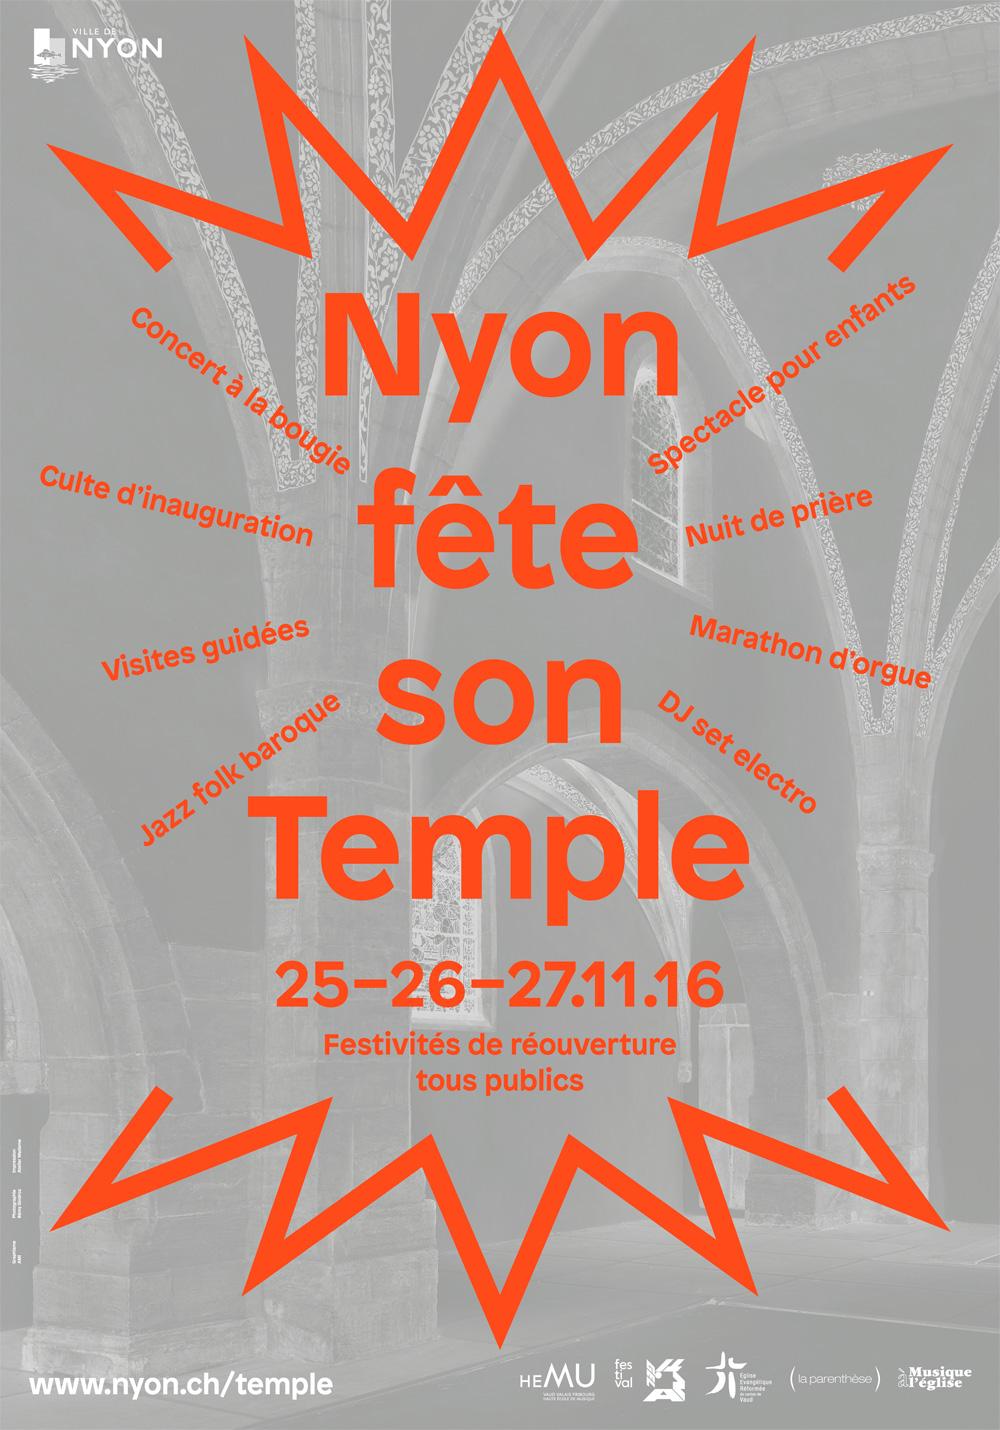 ami-nyon-temple